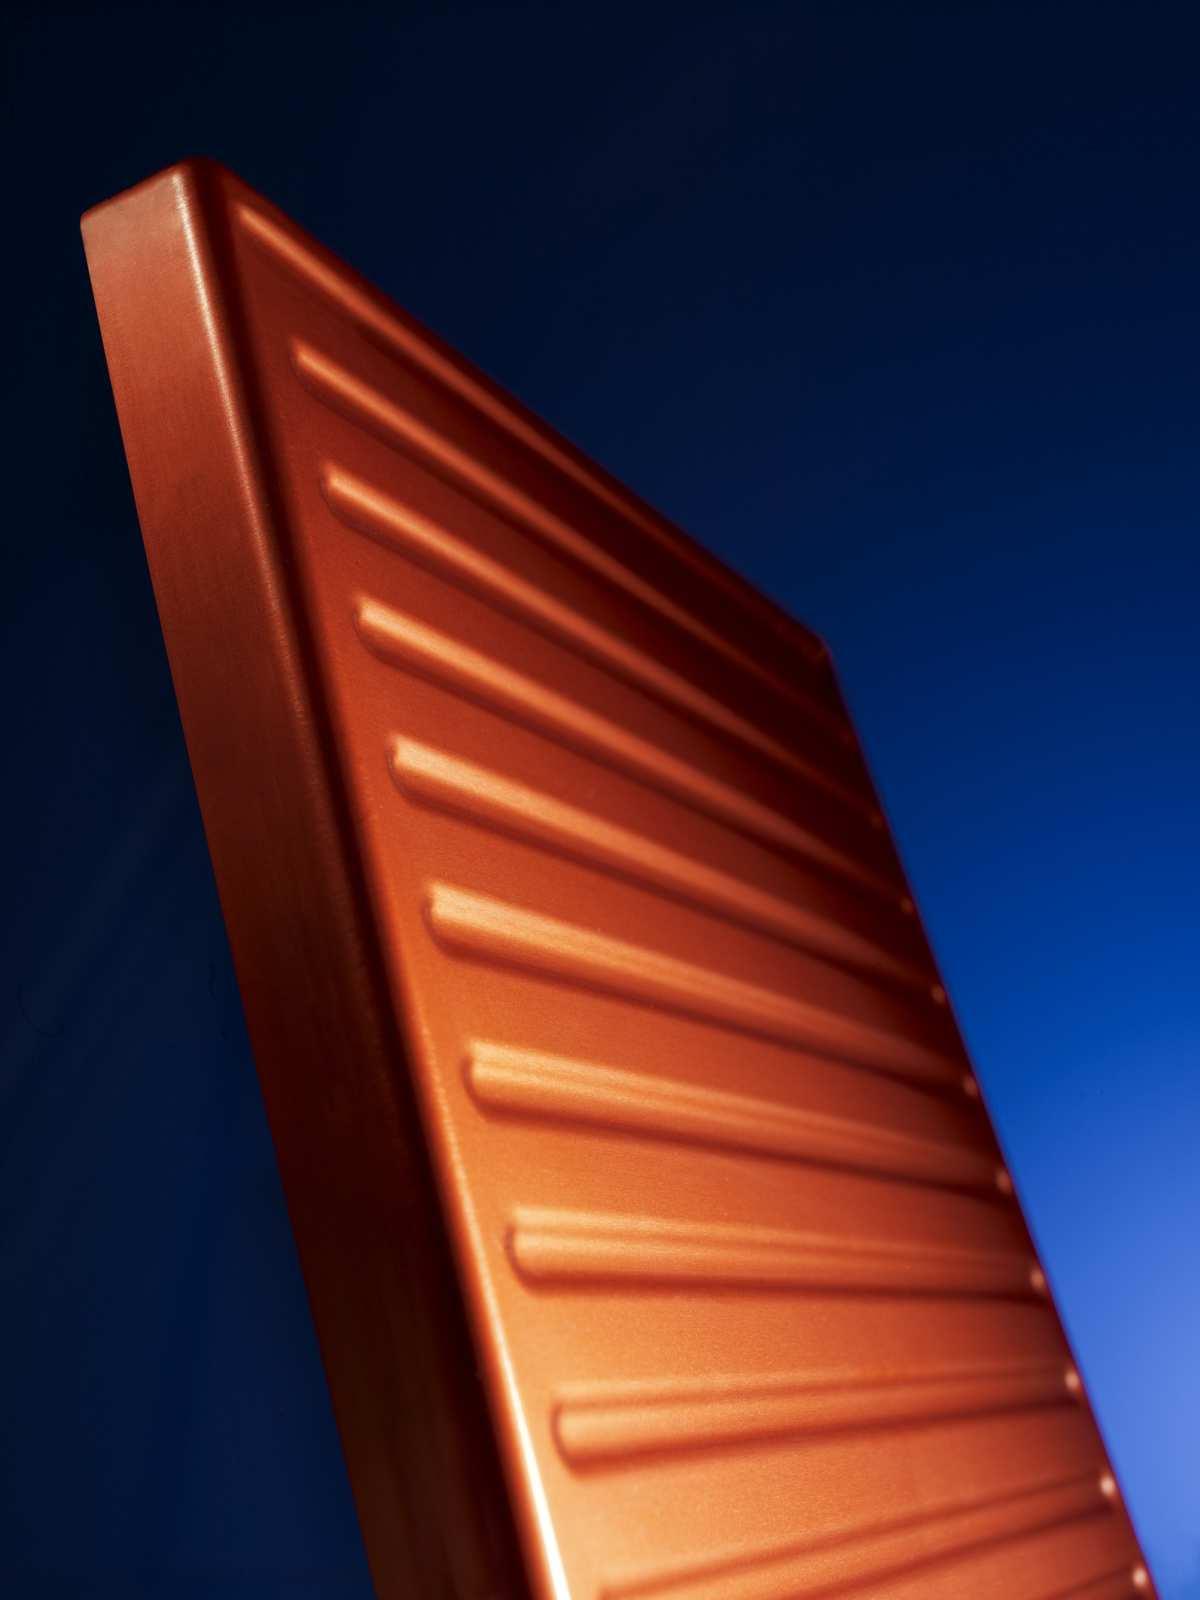 Eloxal mit individuell gefärbter Oberfläche - Firma Holzapfel Group